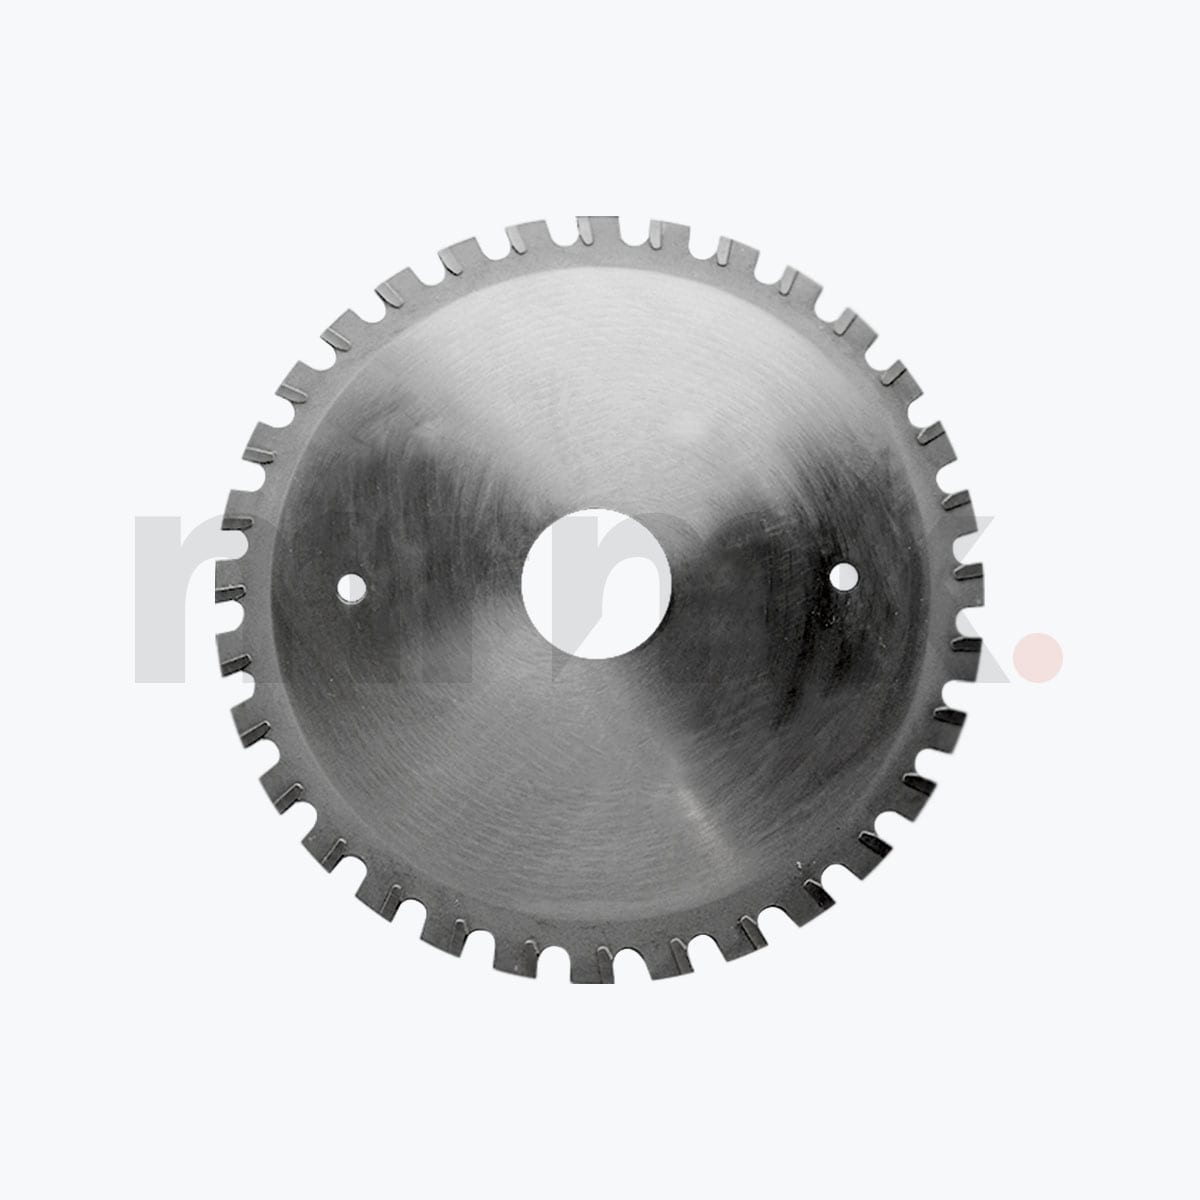 FREUND Compatible Circular Knives 3